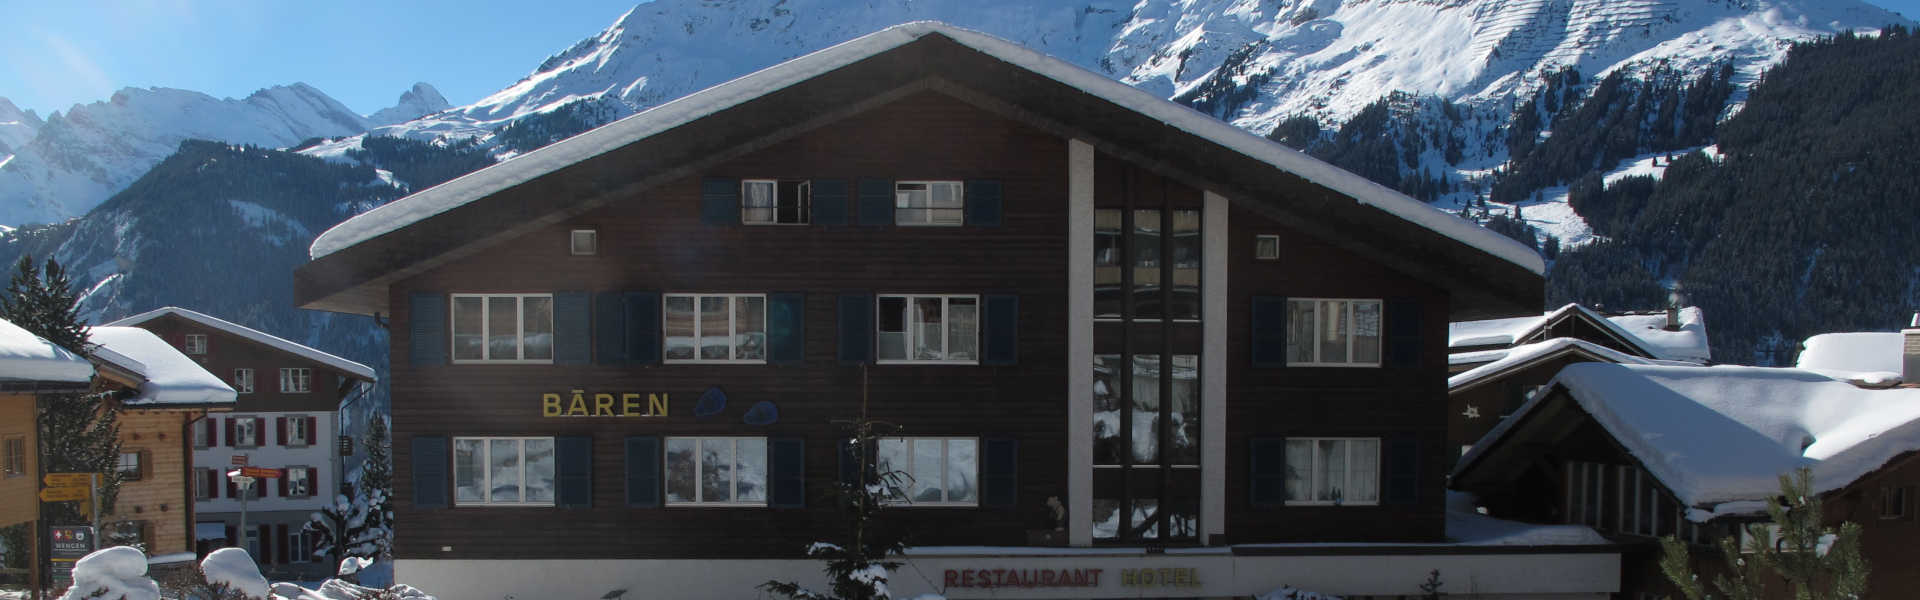 Baren Hotel